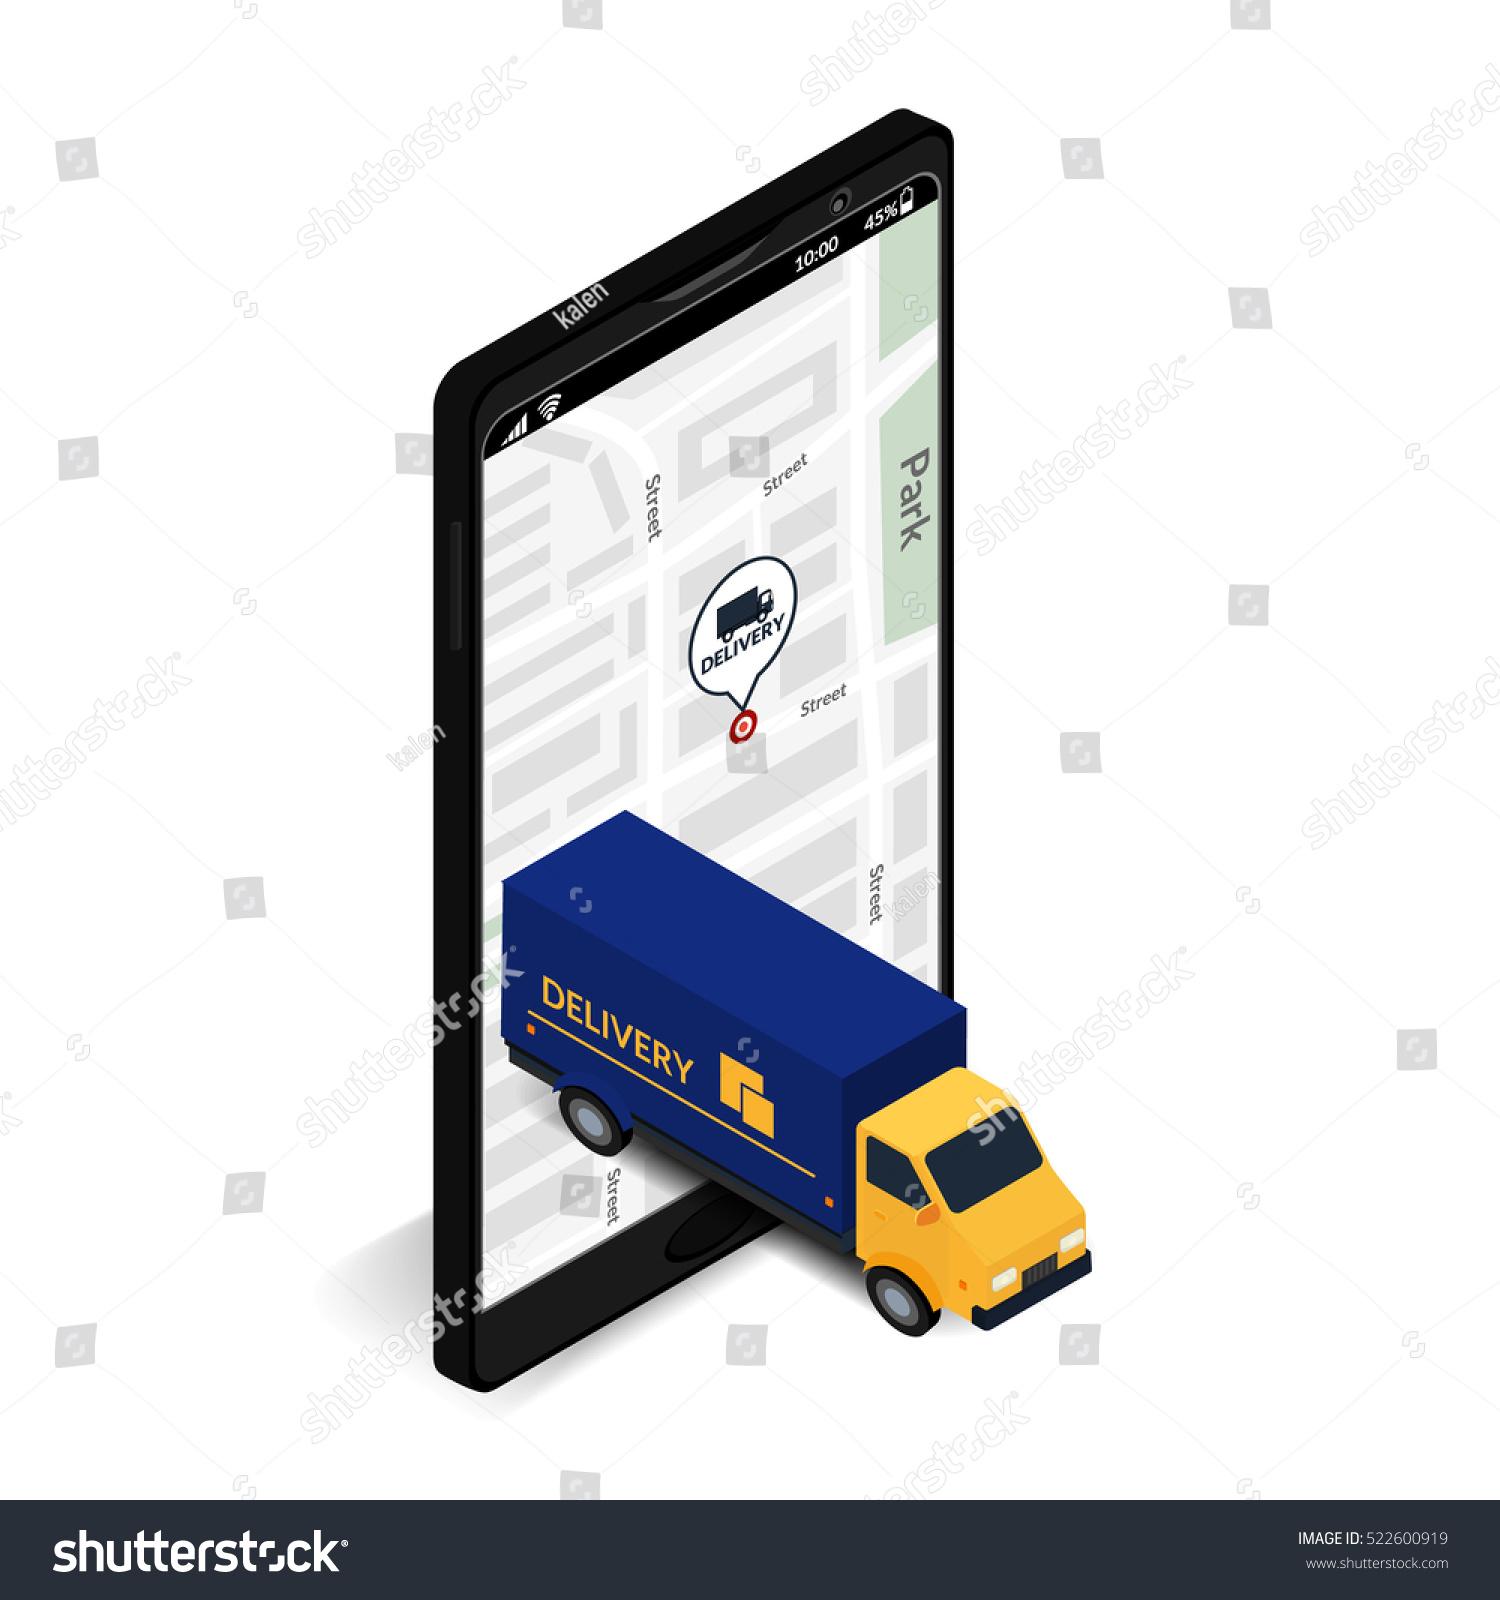 Vector Illustration Truck Mobile Phone Stock Vector